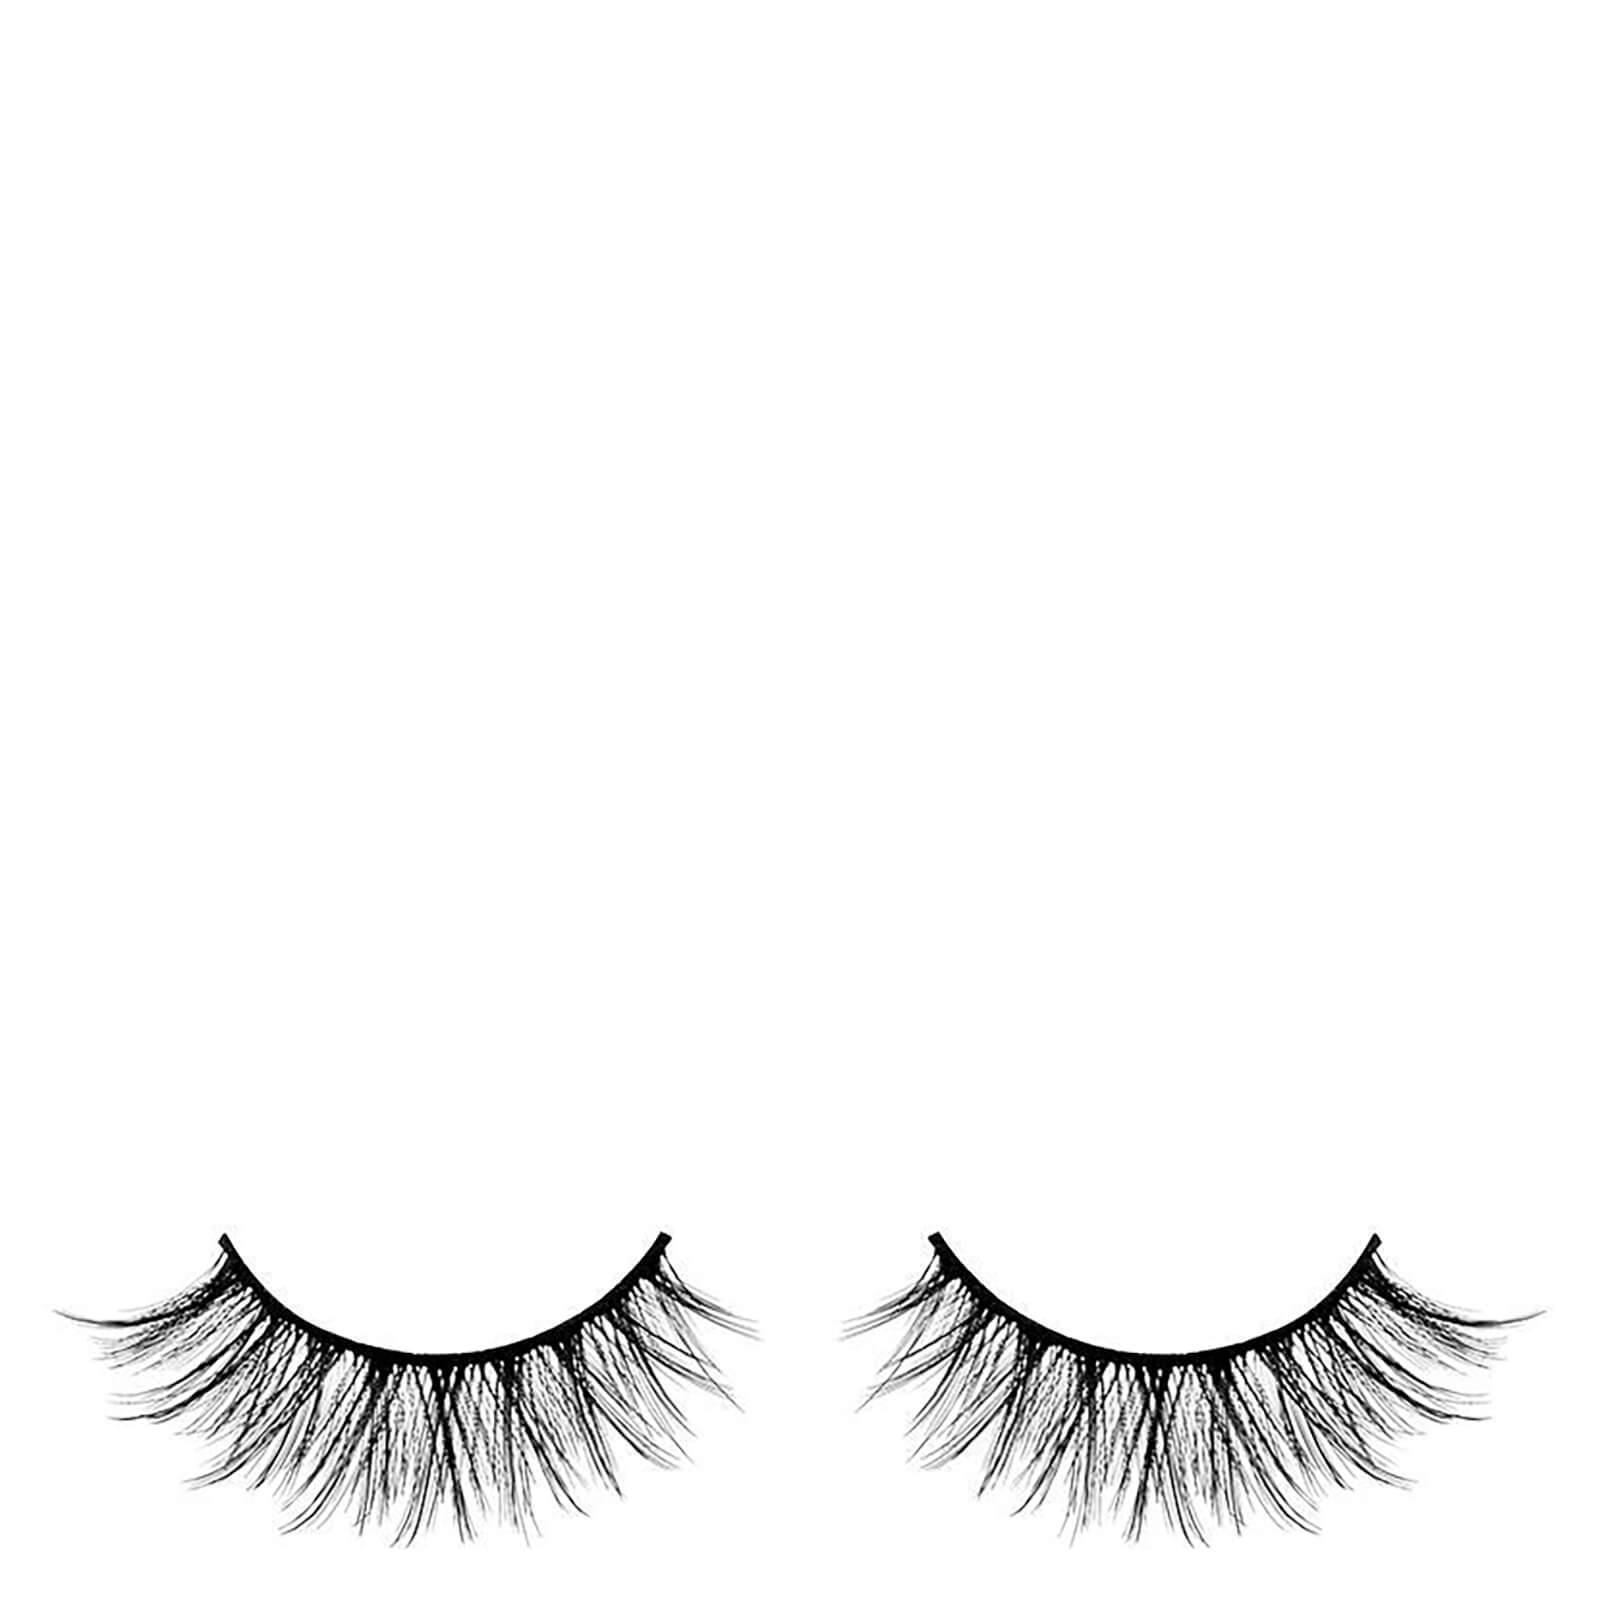 fe412259c98 Morphe Premium Lashes - Hypnotic | Free Shipping | Lookfantastic